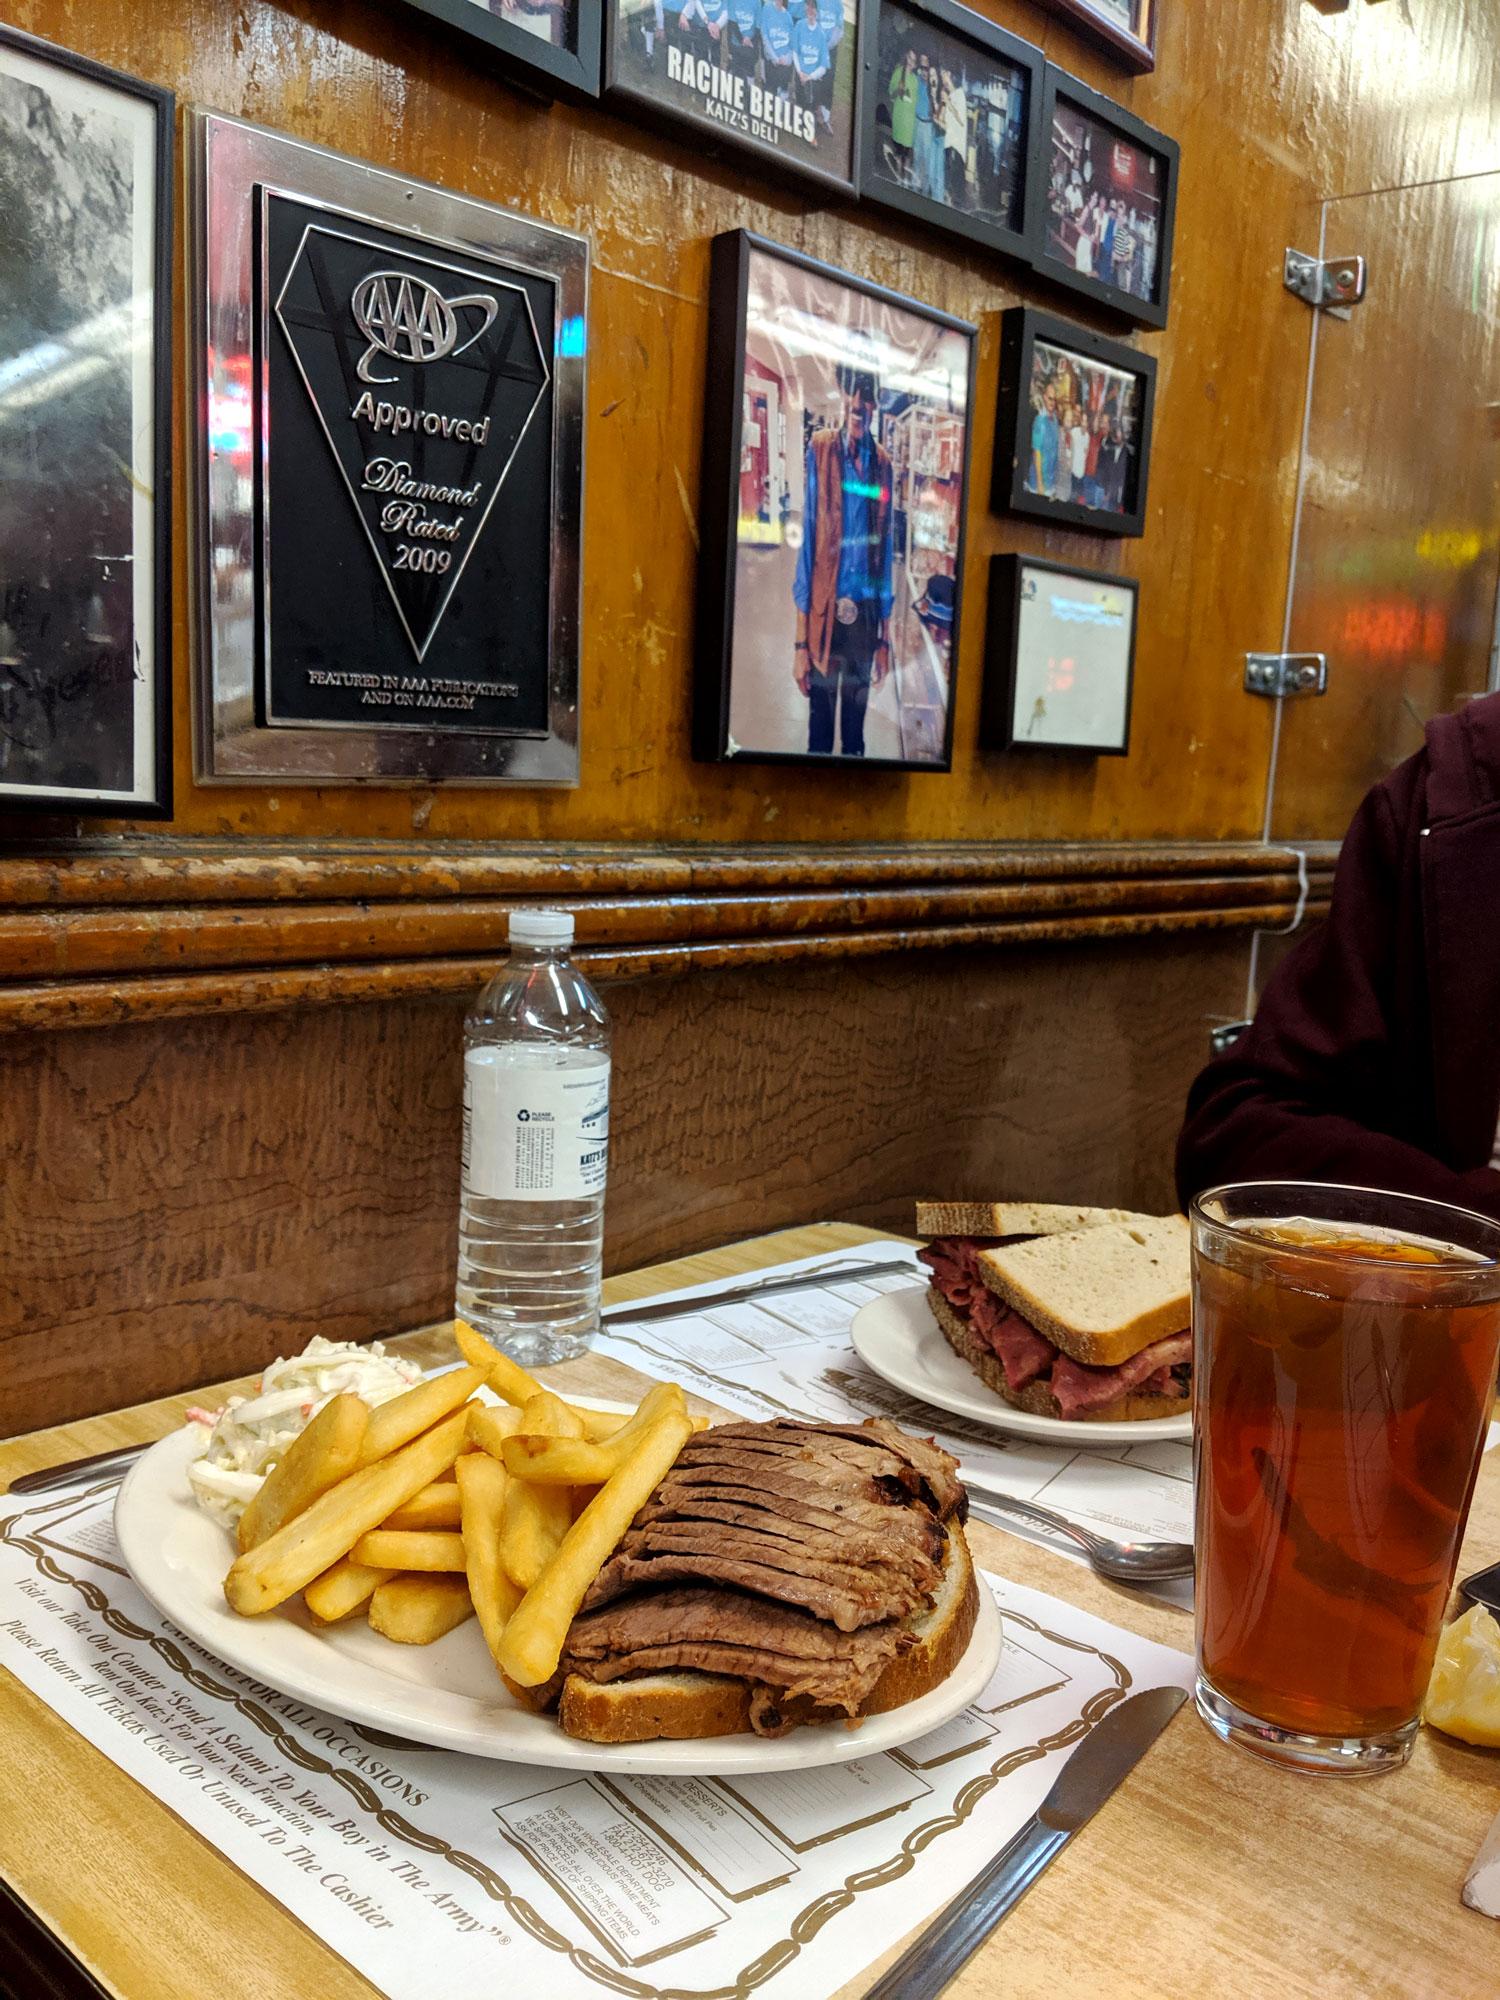 what-i-ate-in-new-york-restaurant-guide-manhattan-12-katz-deli